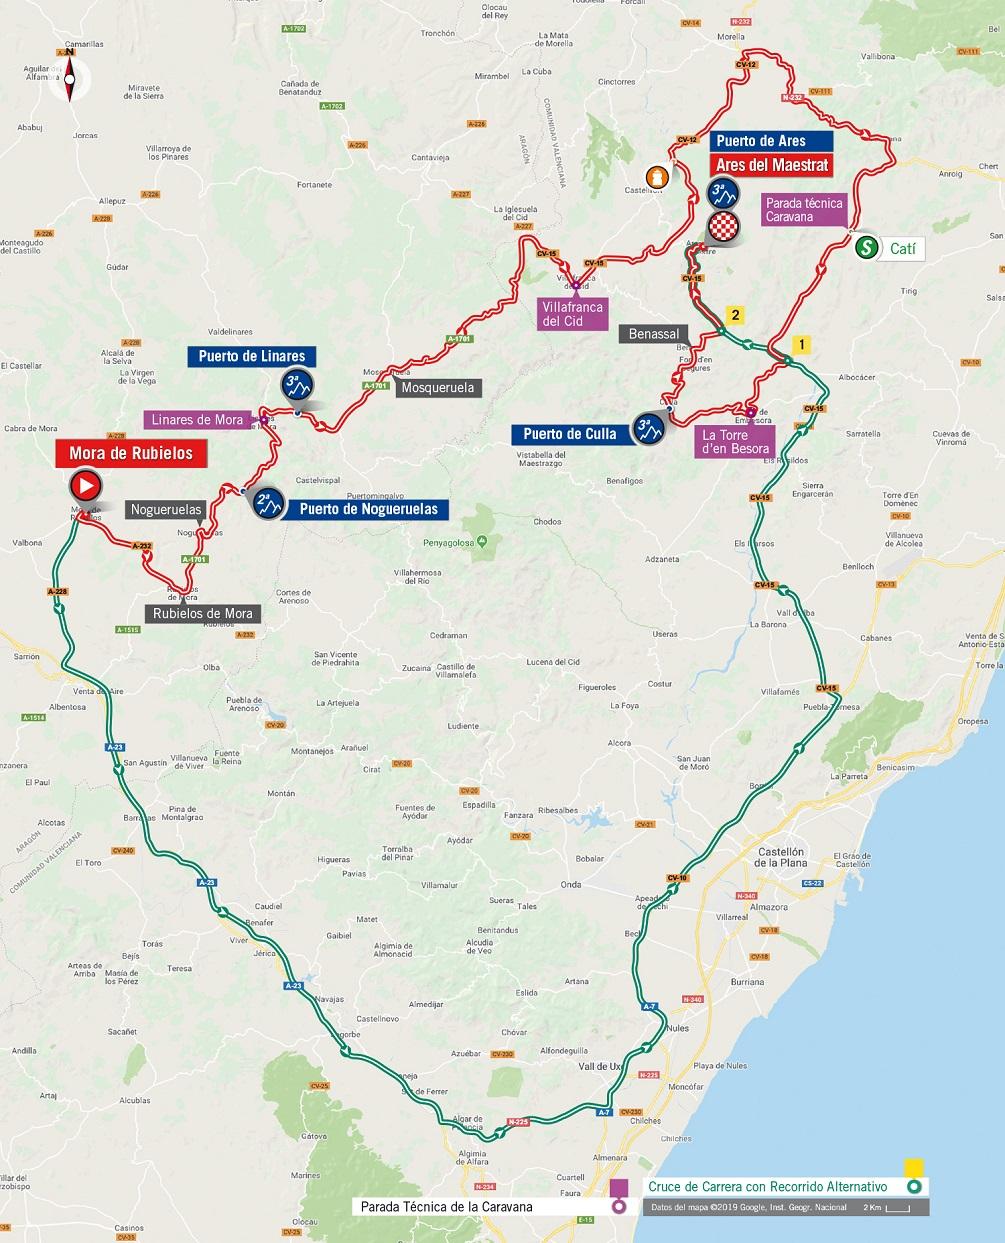 Streckenverlauf Vuelta a España 2019 - Etappe 6